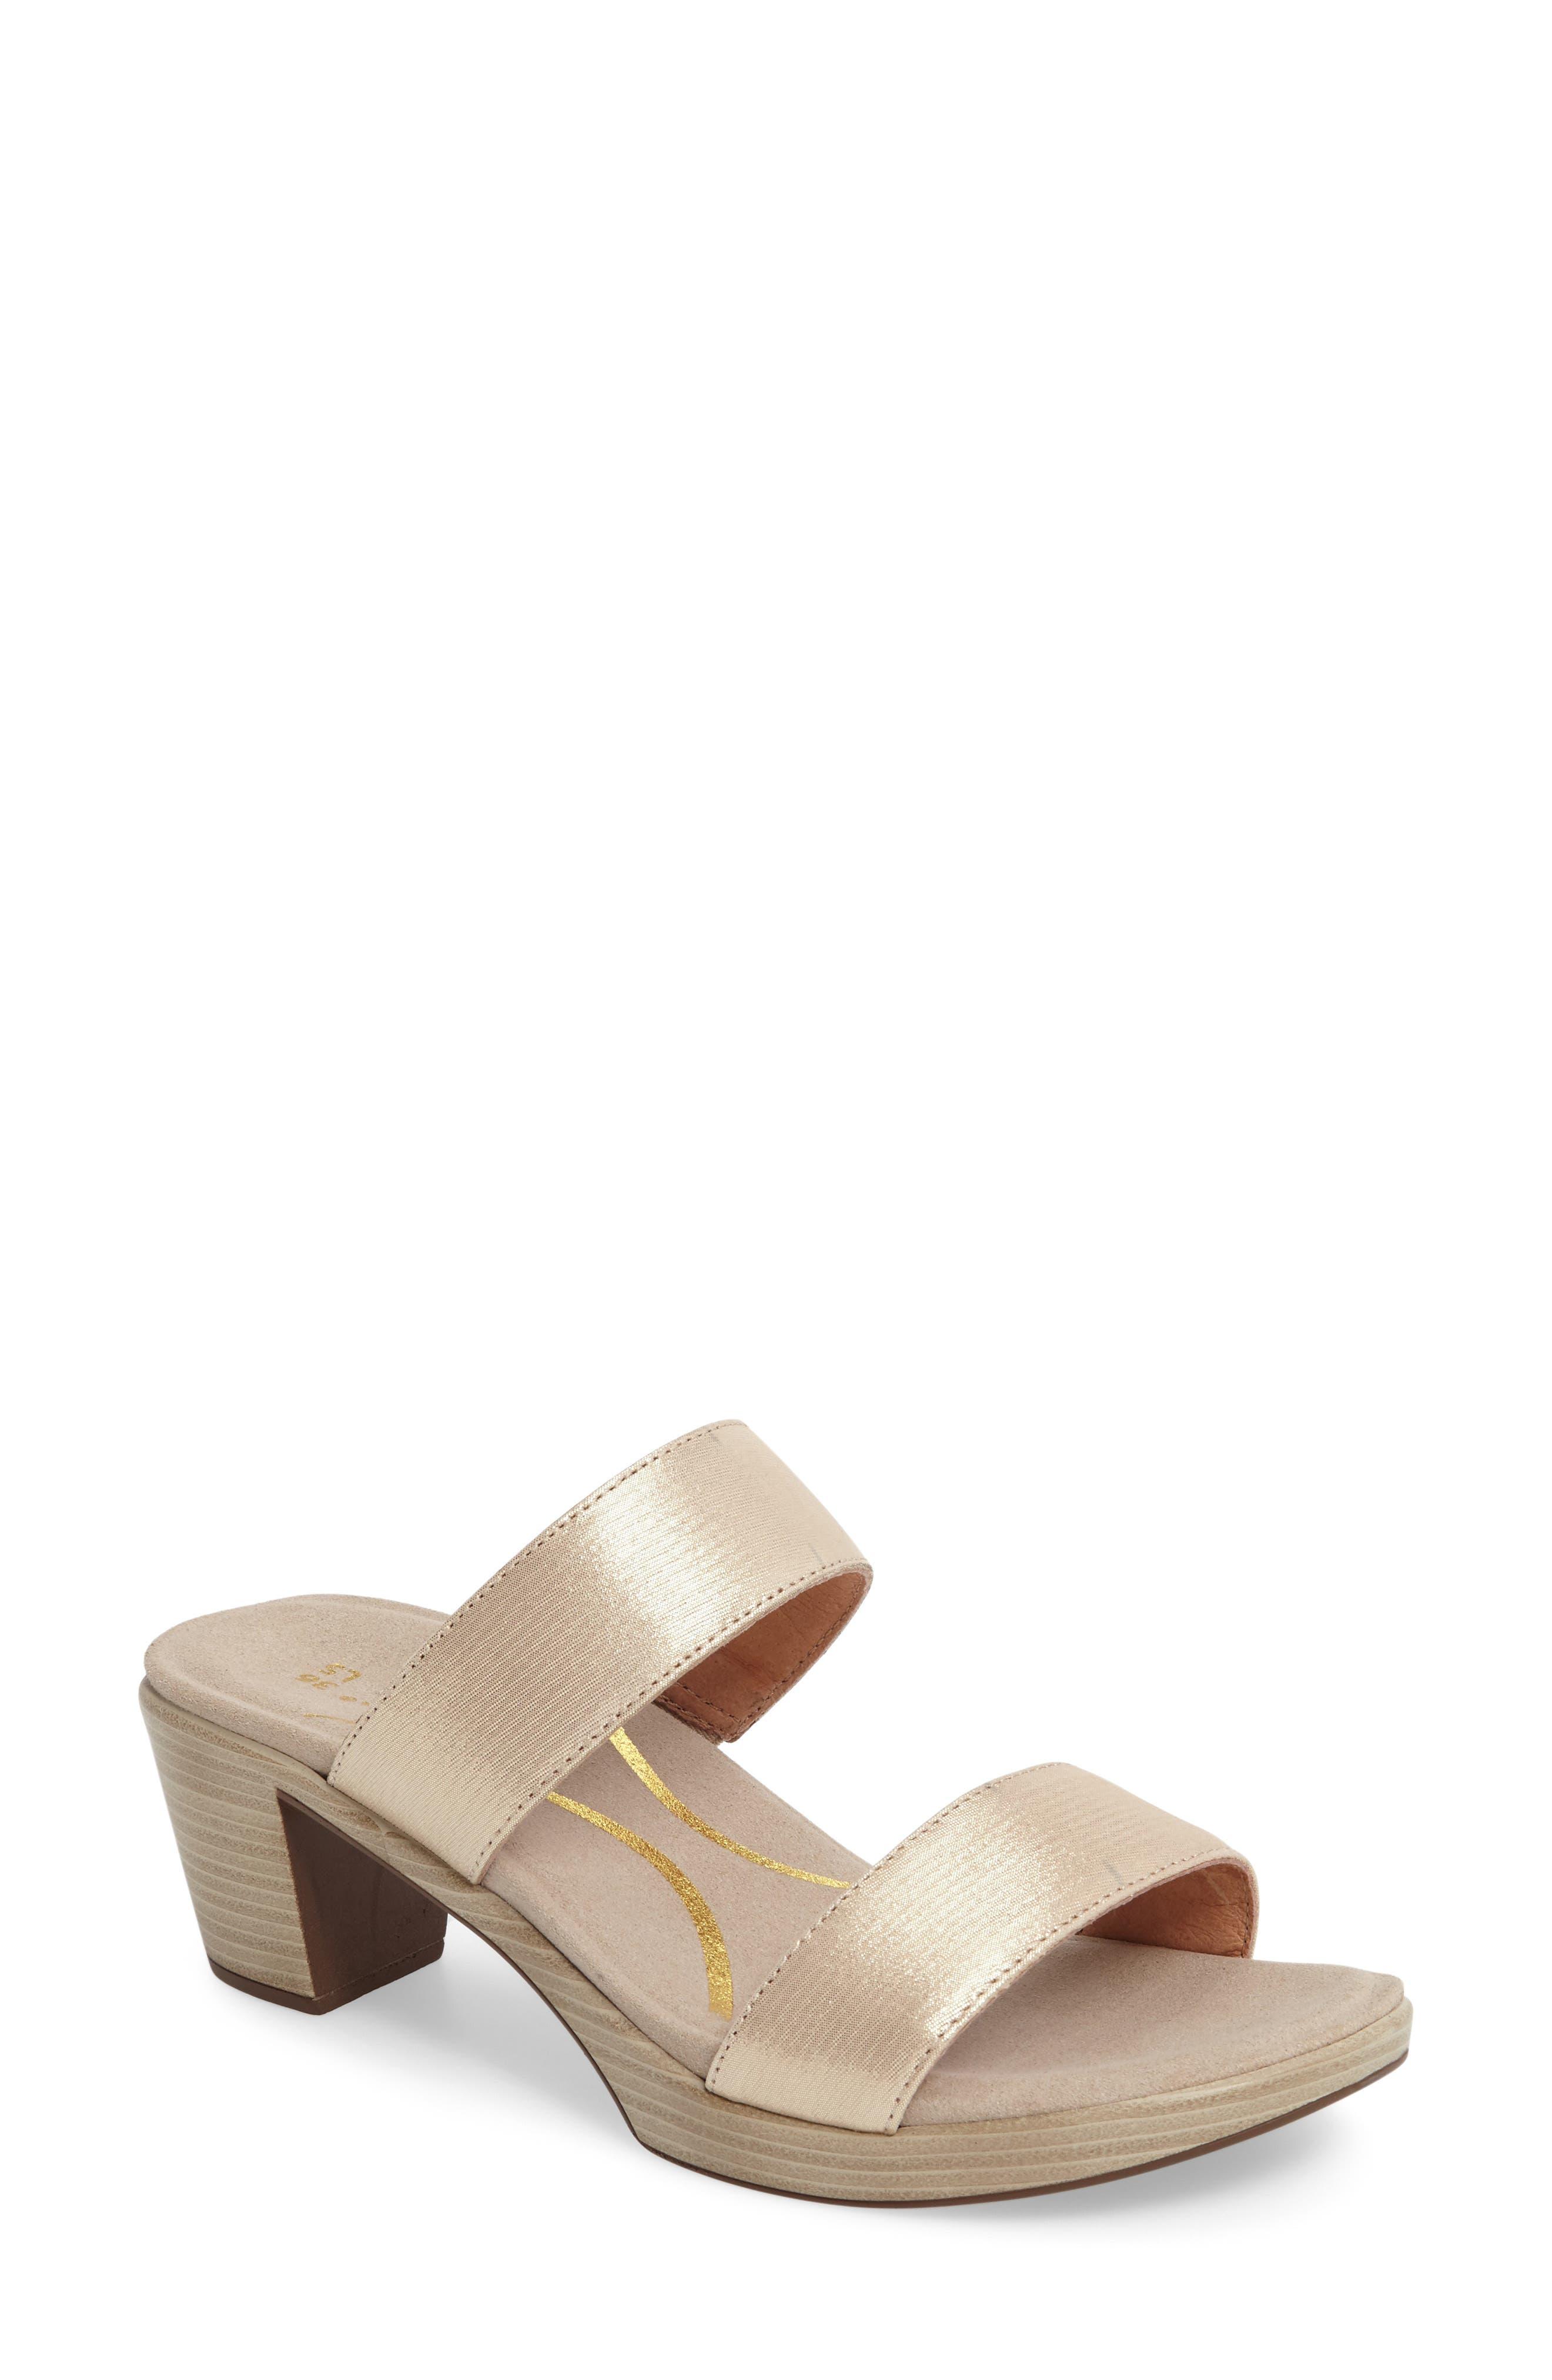 Alternate Image 1 Selected - Naot Fate Platform Sandal (Women)